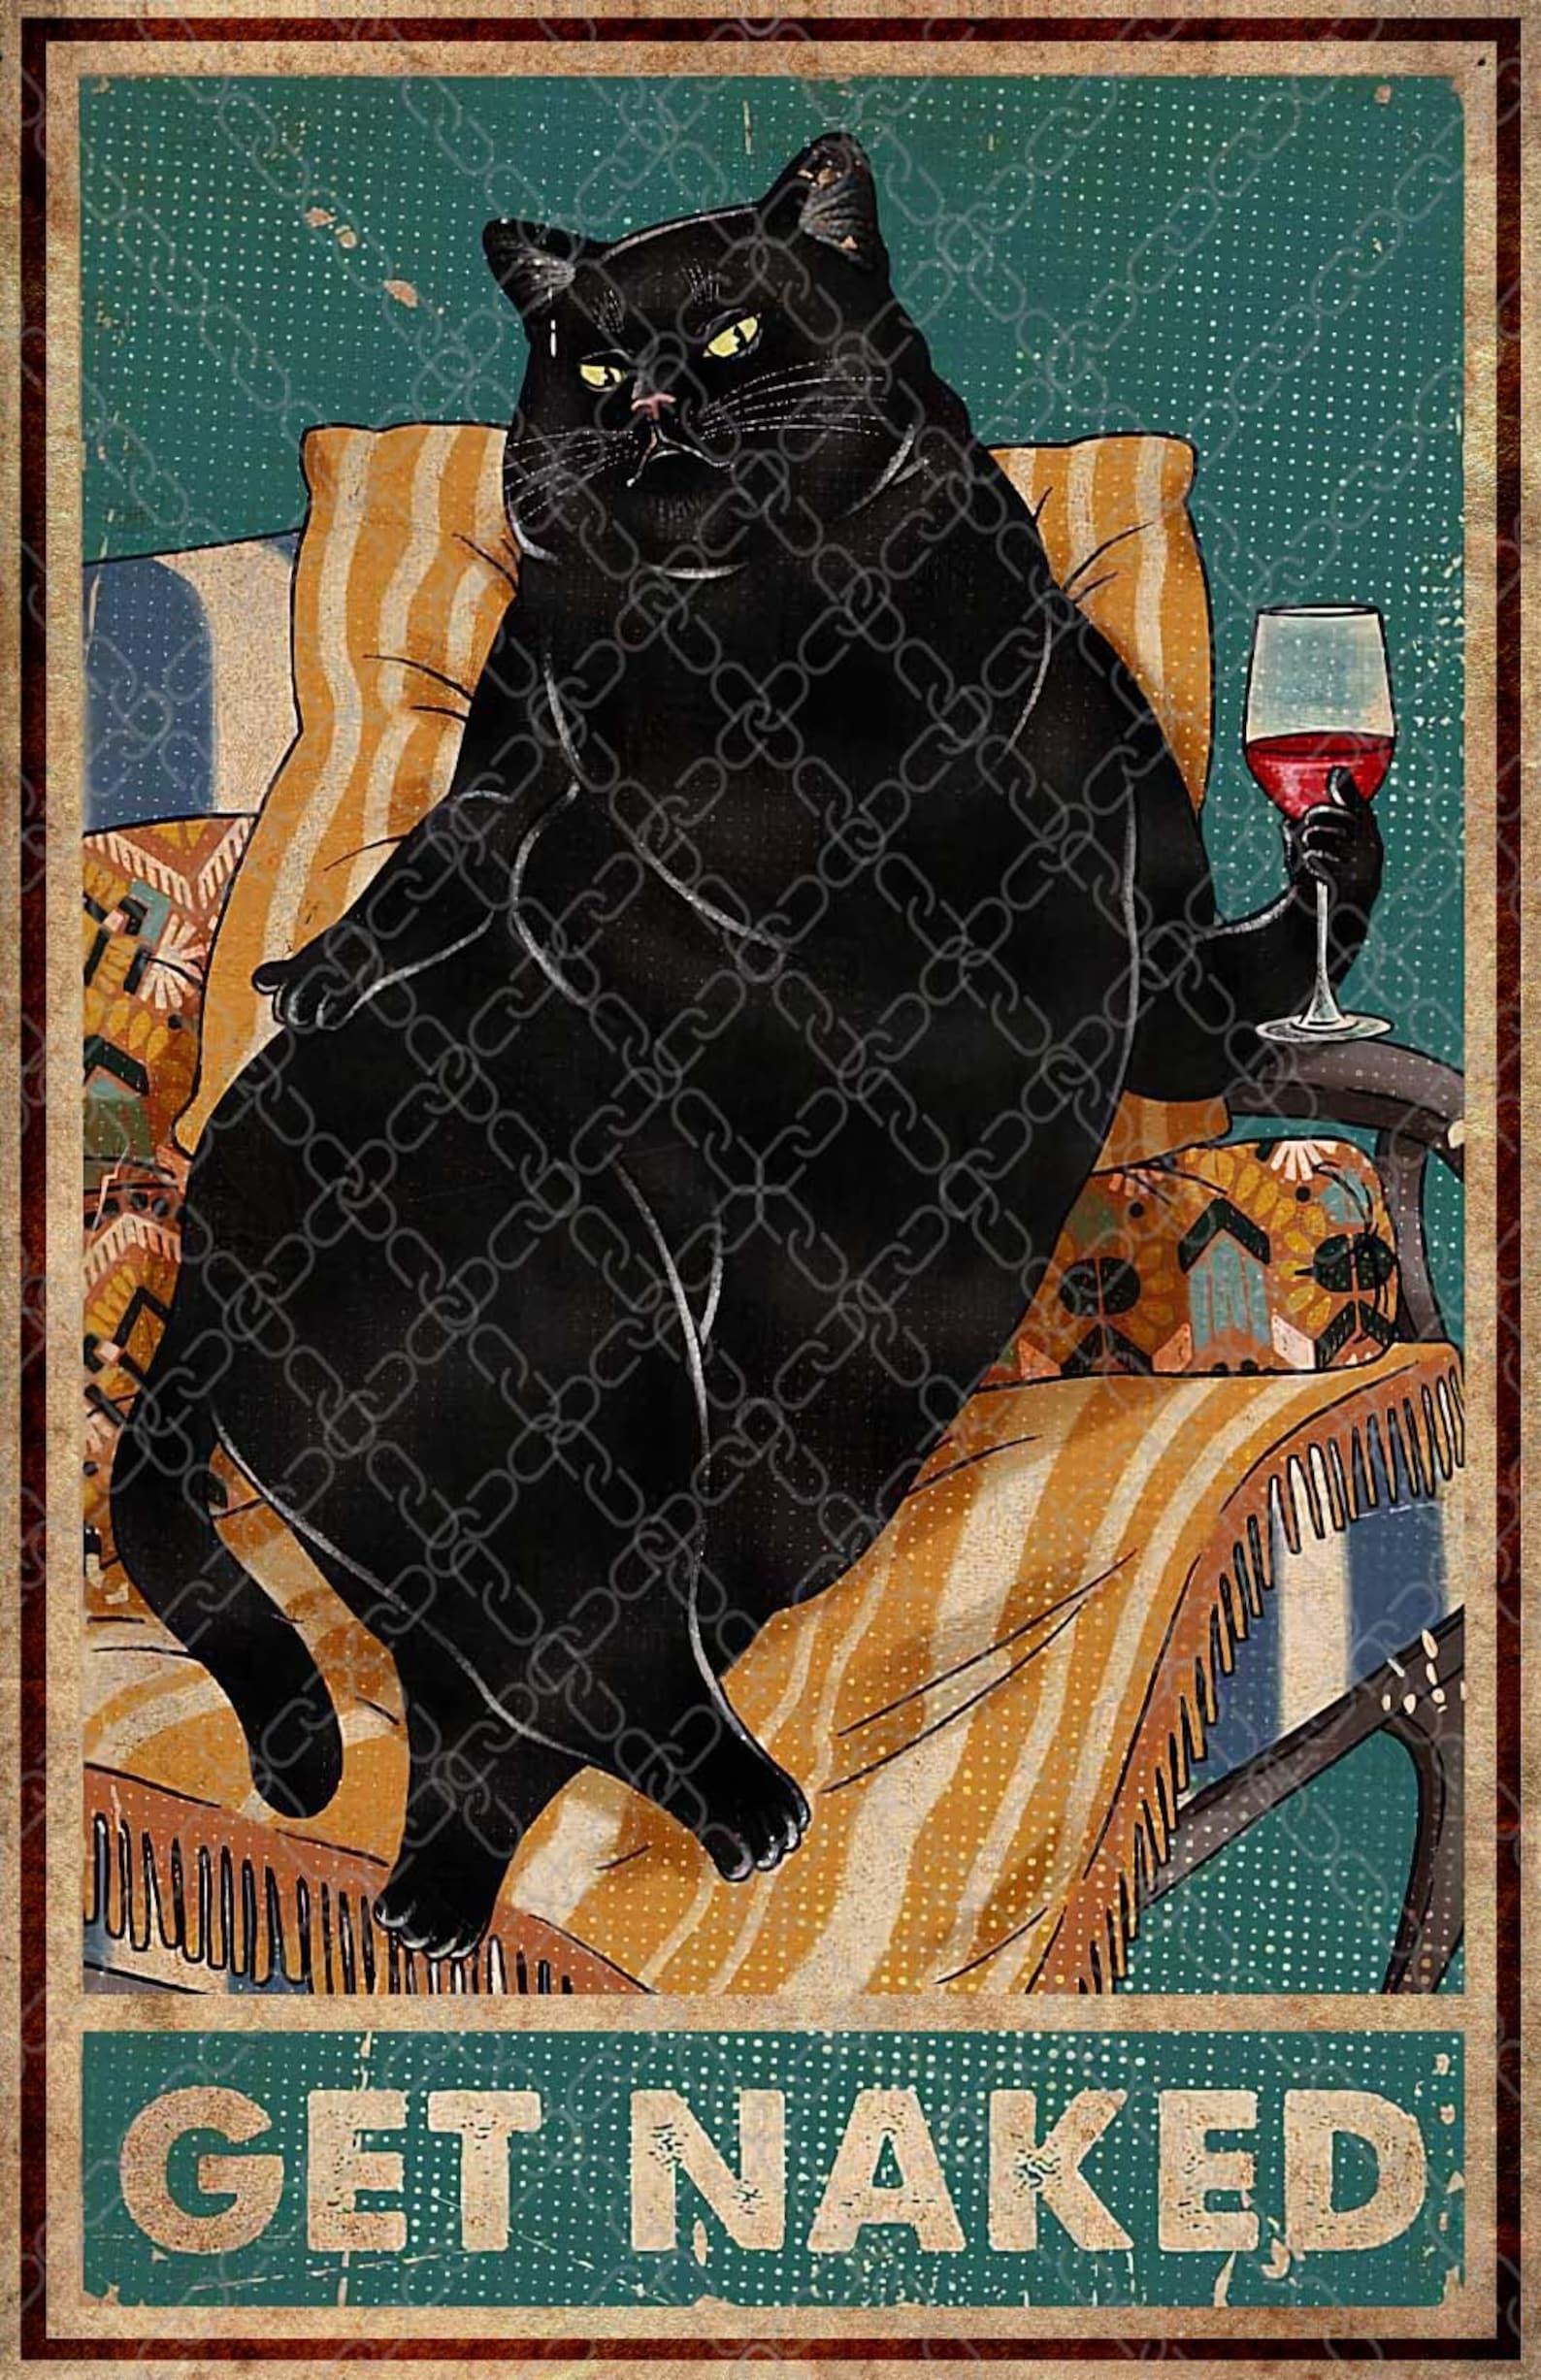 Get Naked Poster Black Cat Poster Retro Cat Wall Art Cat